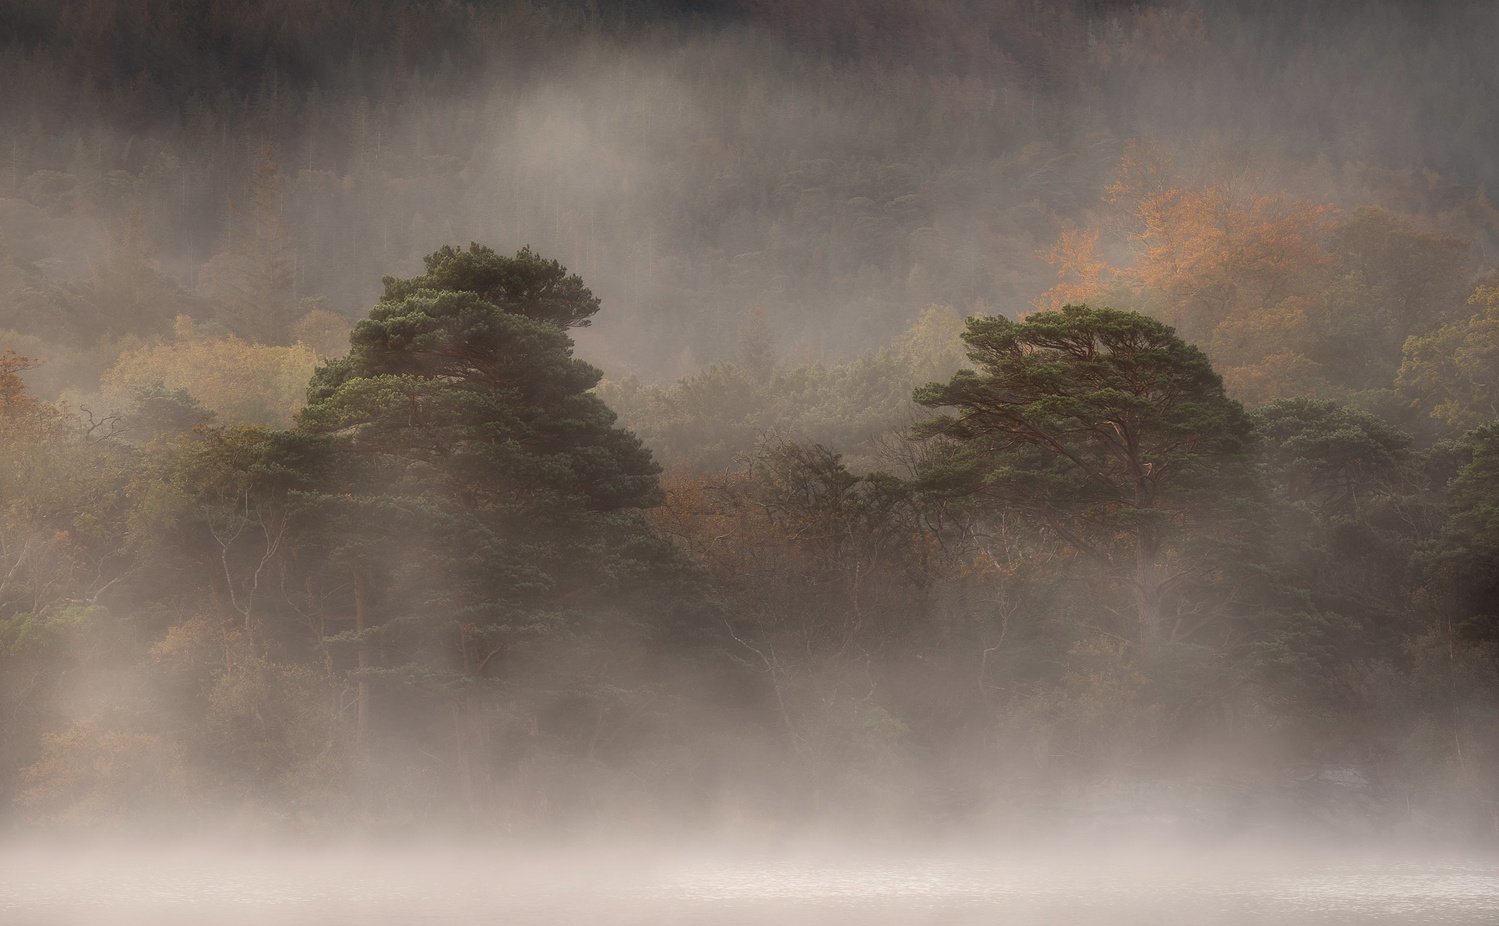 Pines in the Mist by Sean O' Riordan